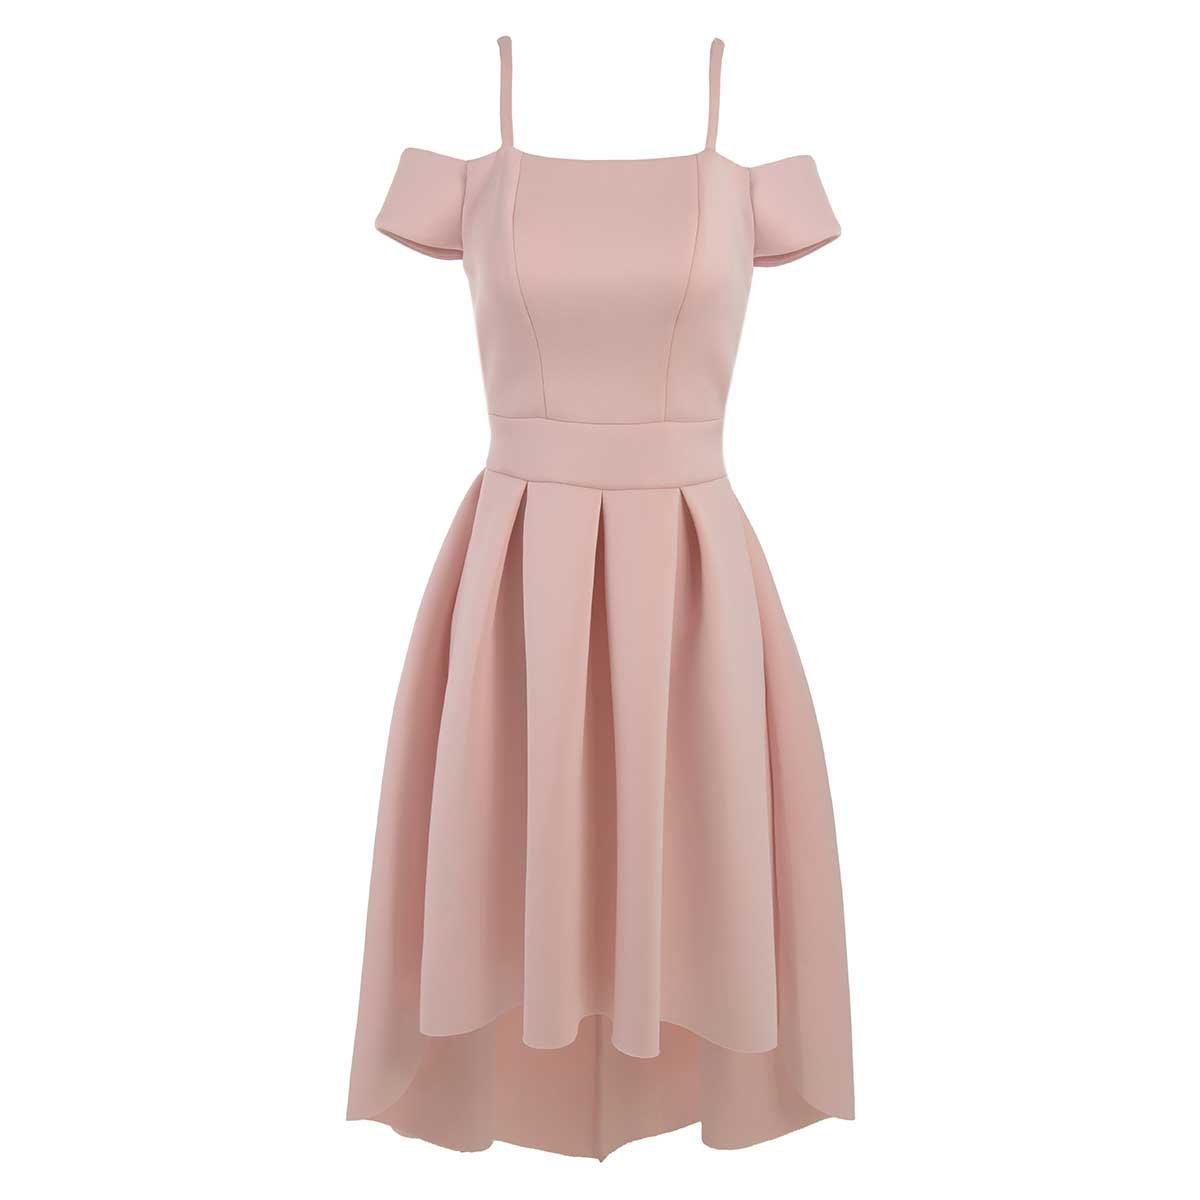 Lujo Sears Vestidos Para Bodas Modelo - Colección de Vestidos de ...